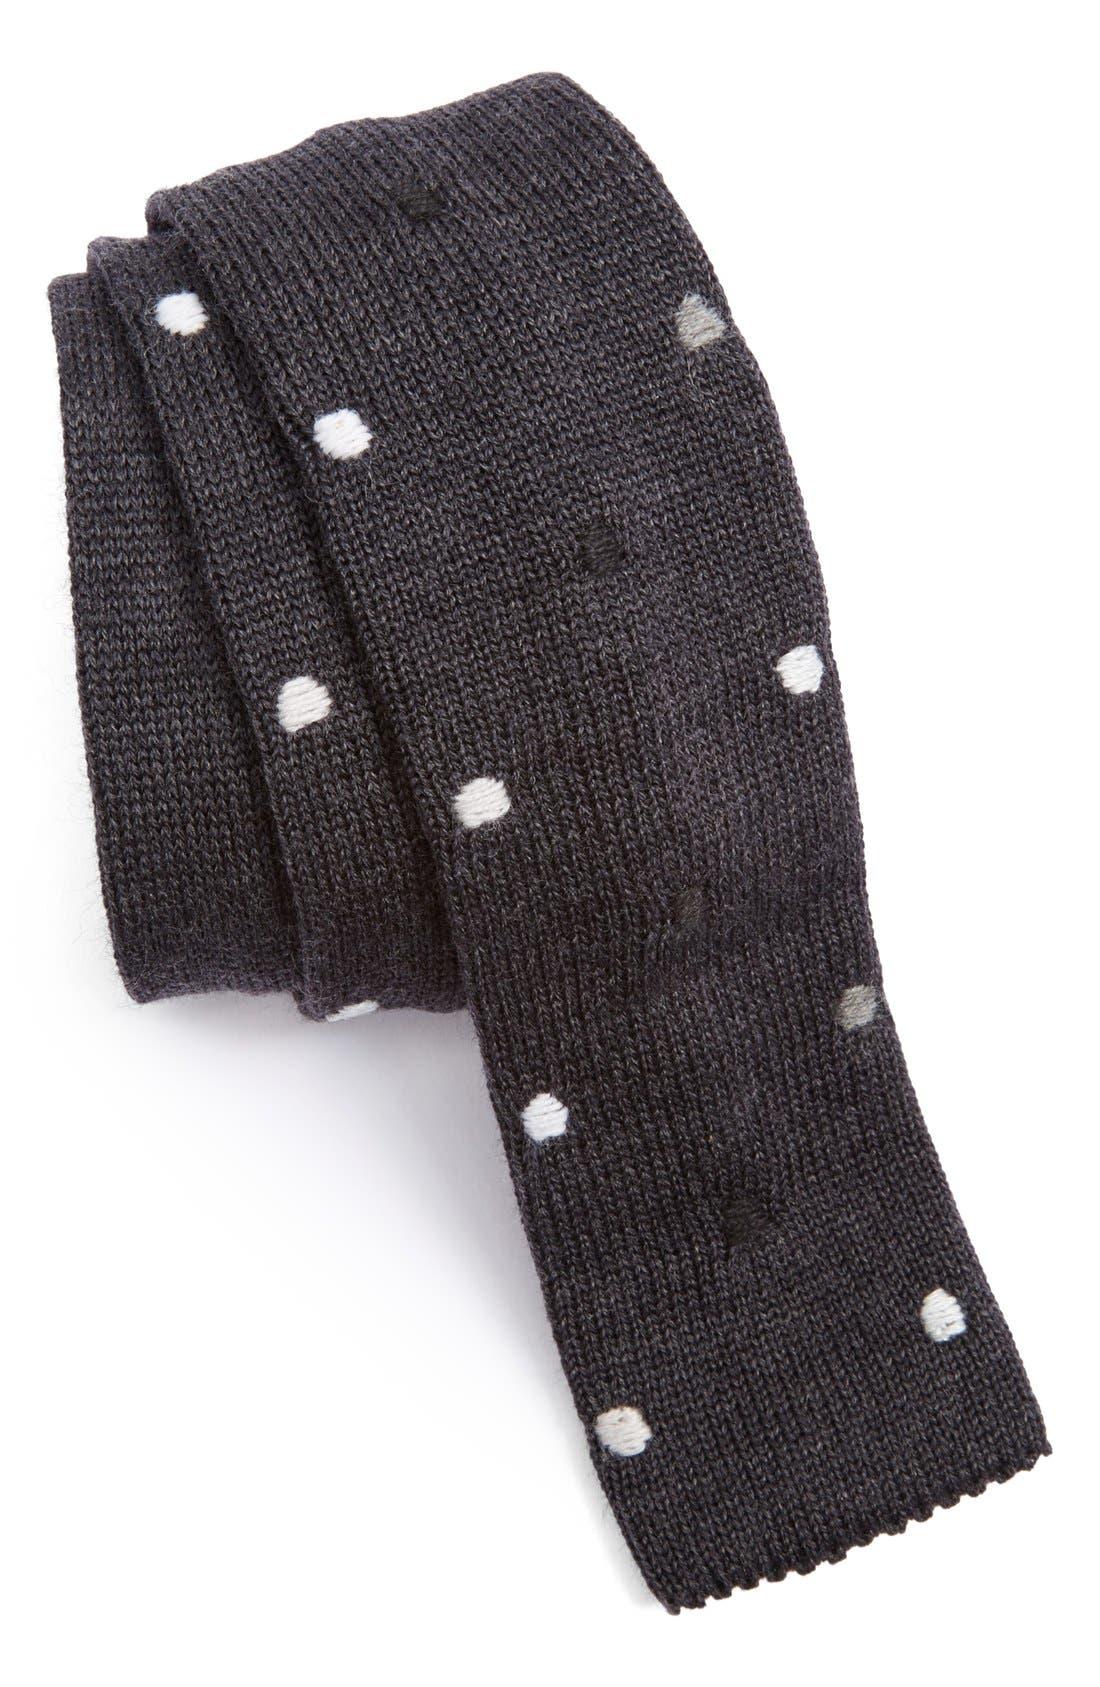 Main Image - Paul Smith Knit Wool Tie